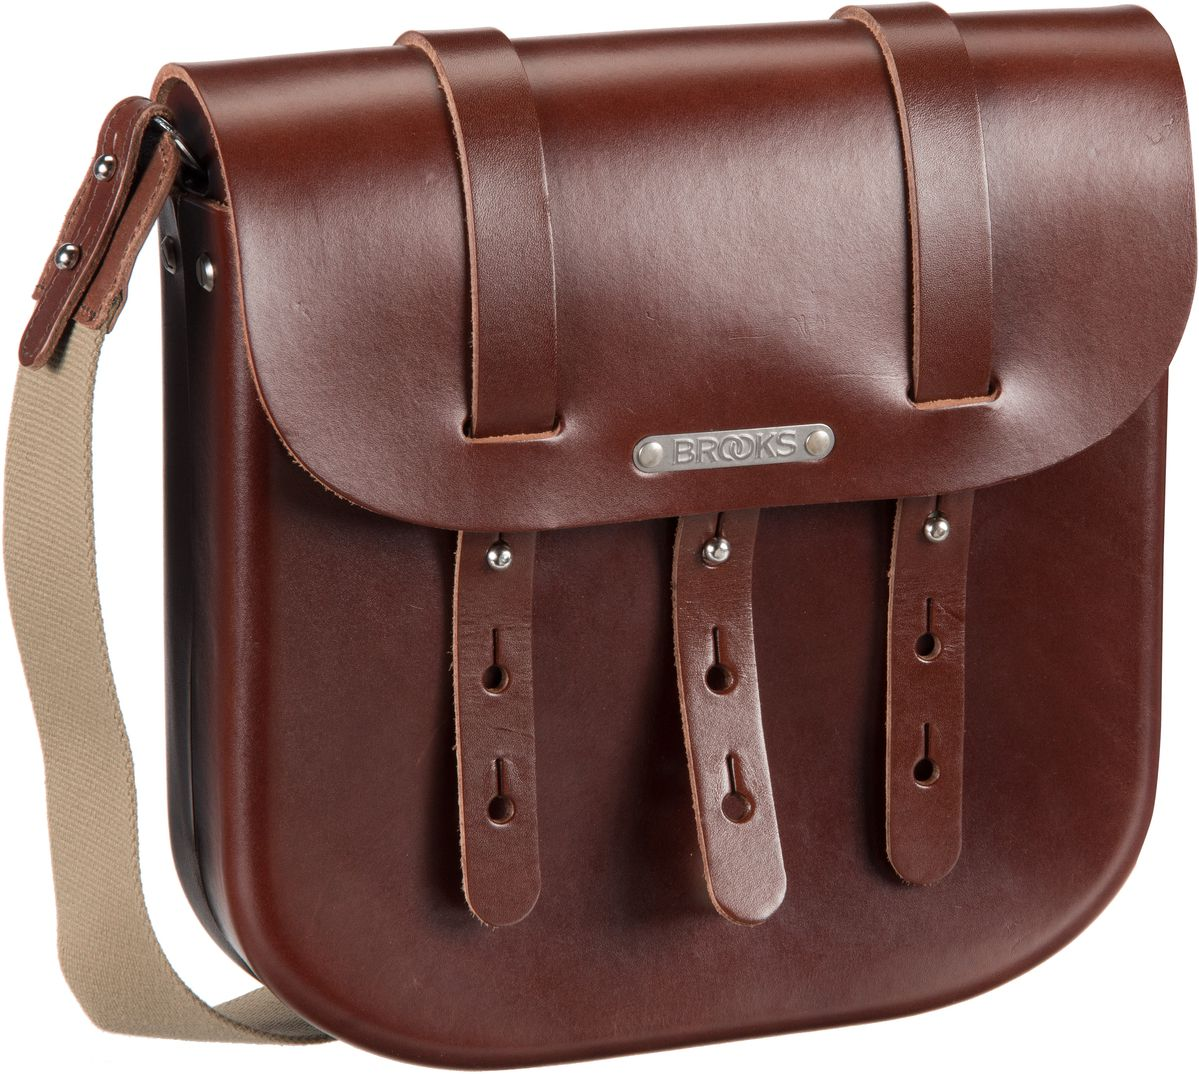 Brooks England Umhängetasche B3 Leather Bag Brown (5.5 Liter)